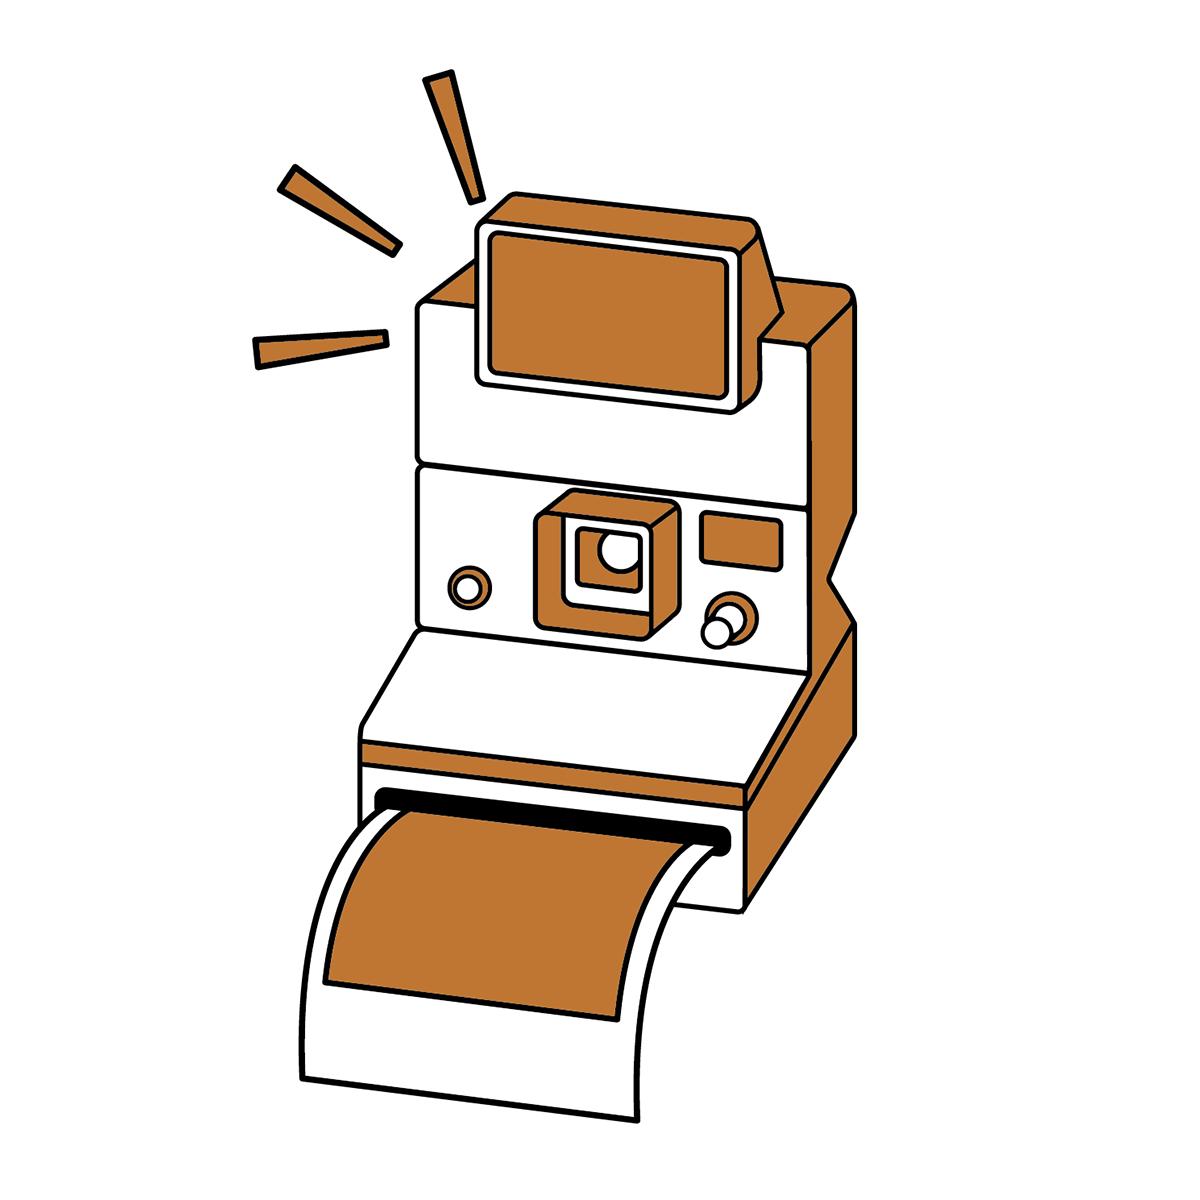 TAM87030 - Maskeringsteip med dispenser, 6 mm